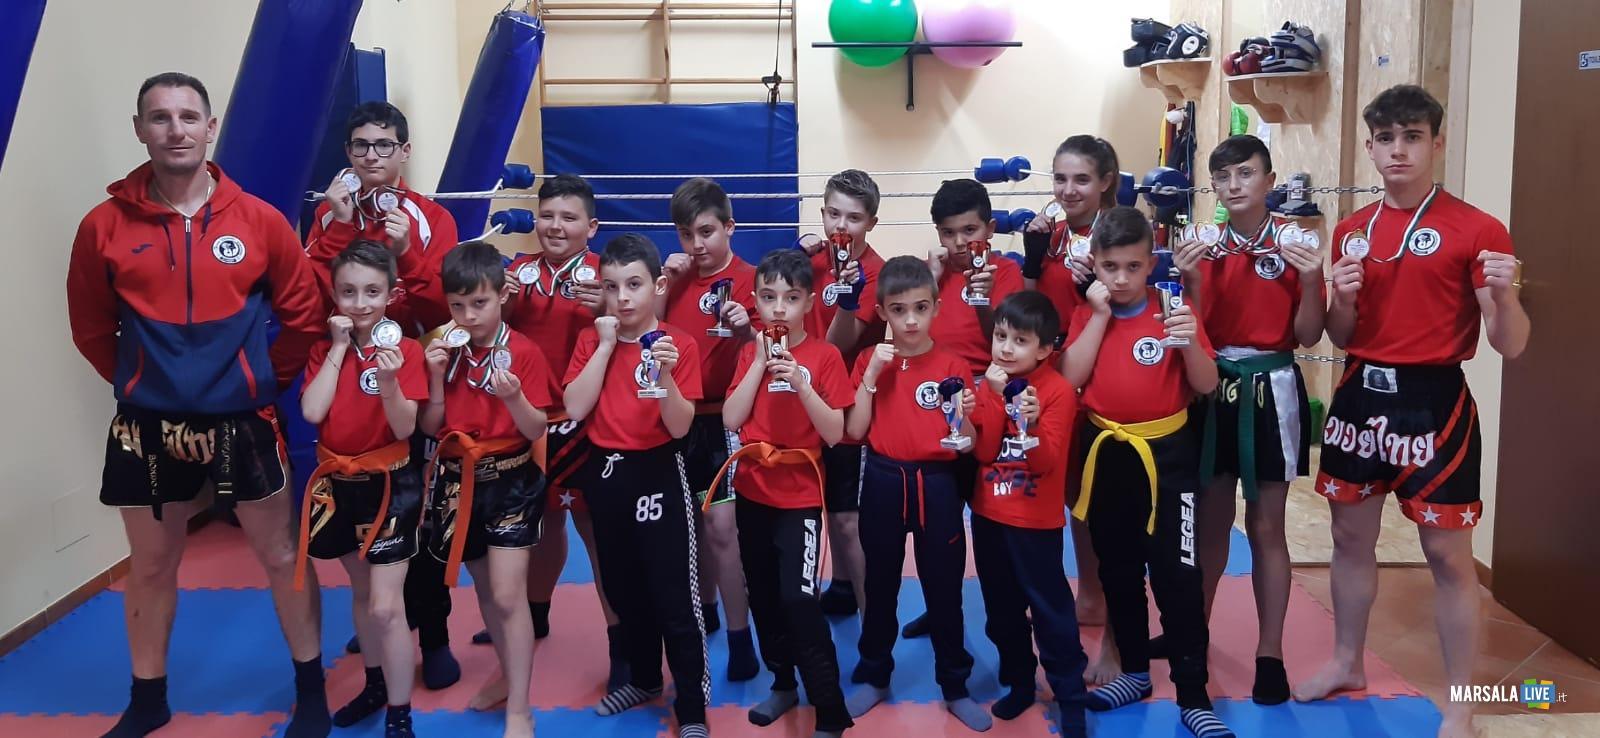 Team Biondo Kickboxing di Giuseppe Biondo marsala